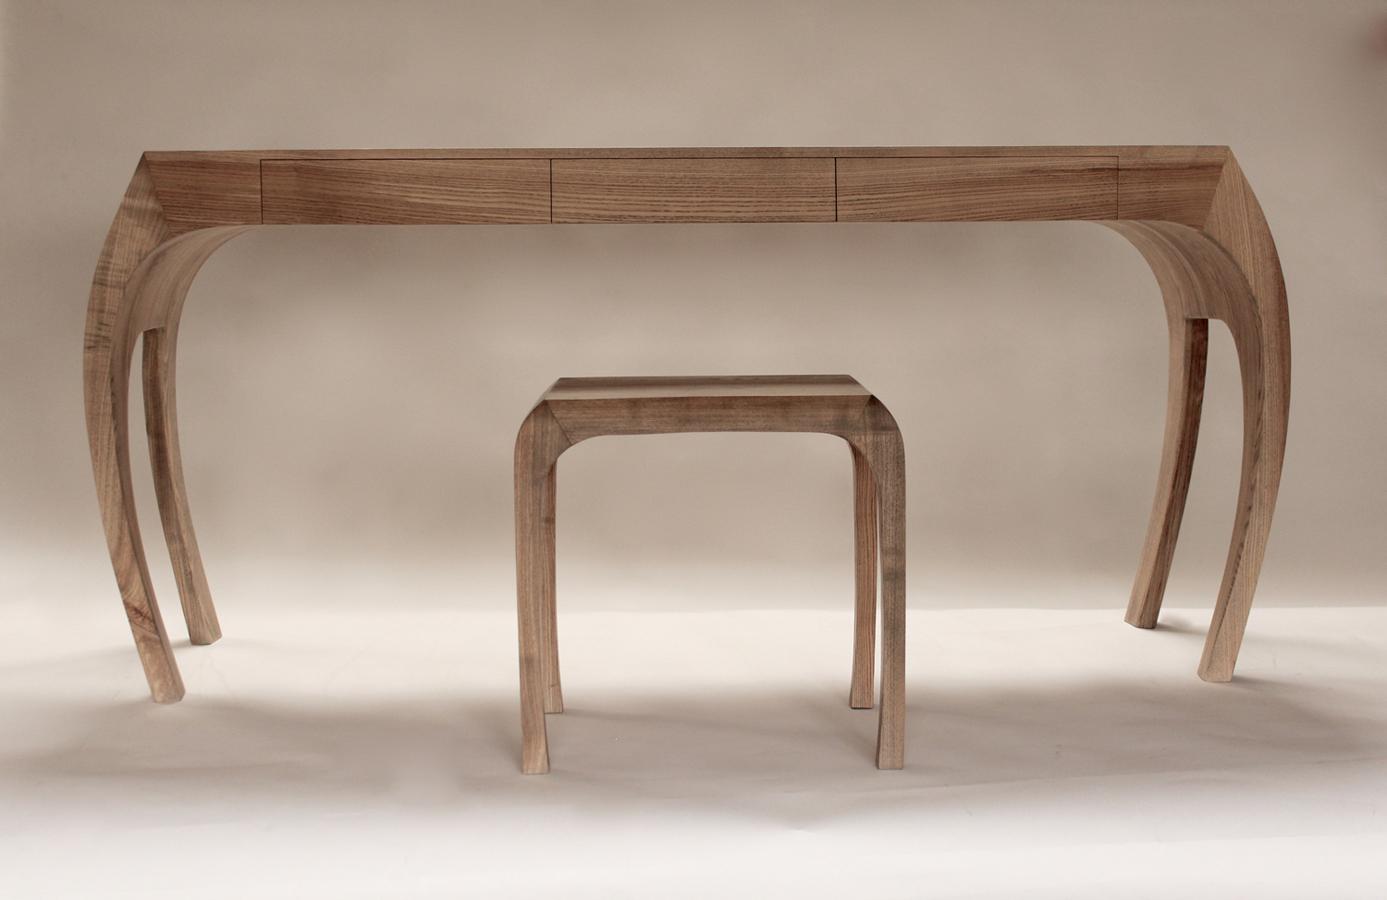 10Ash-dressing-table-and-stool-with-ebony-grain_2.jpg